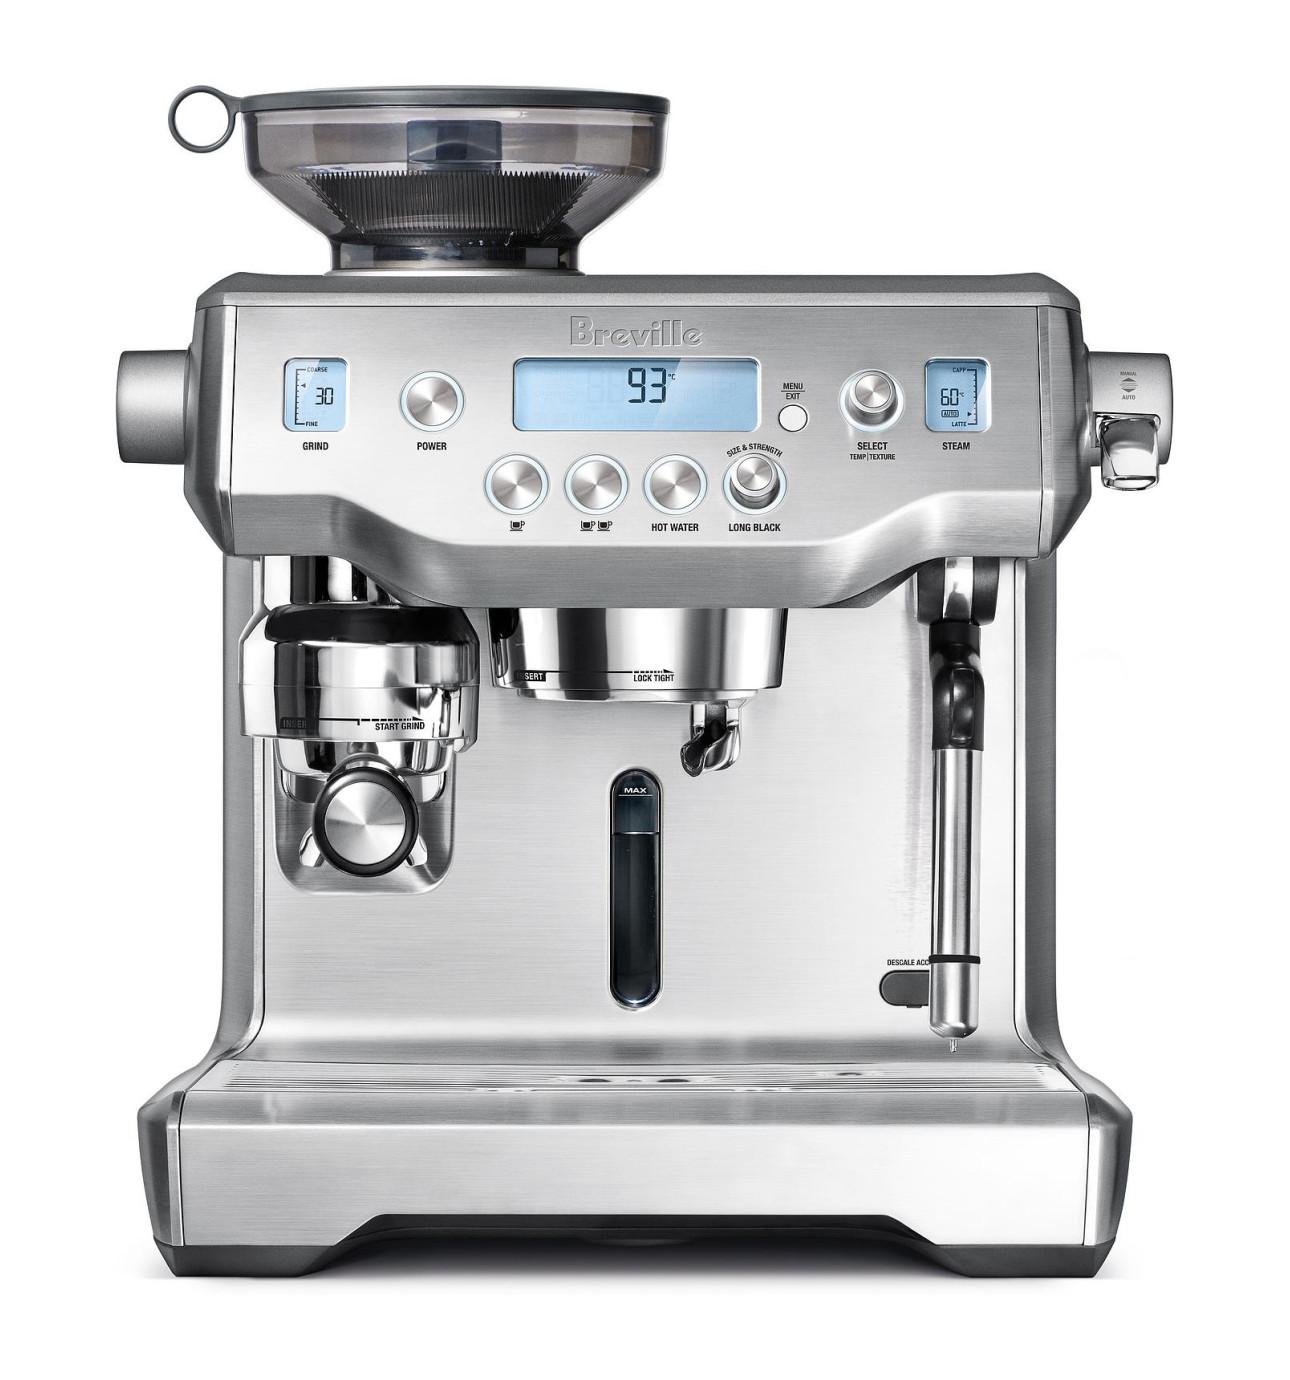 Electronic David Jones Coffee Machines david jones coffee machines grinders delonghi bes980 the oracle espresso machine